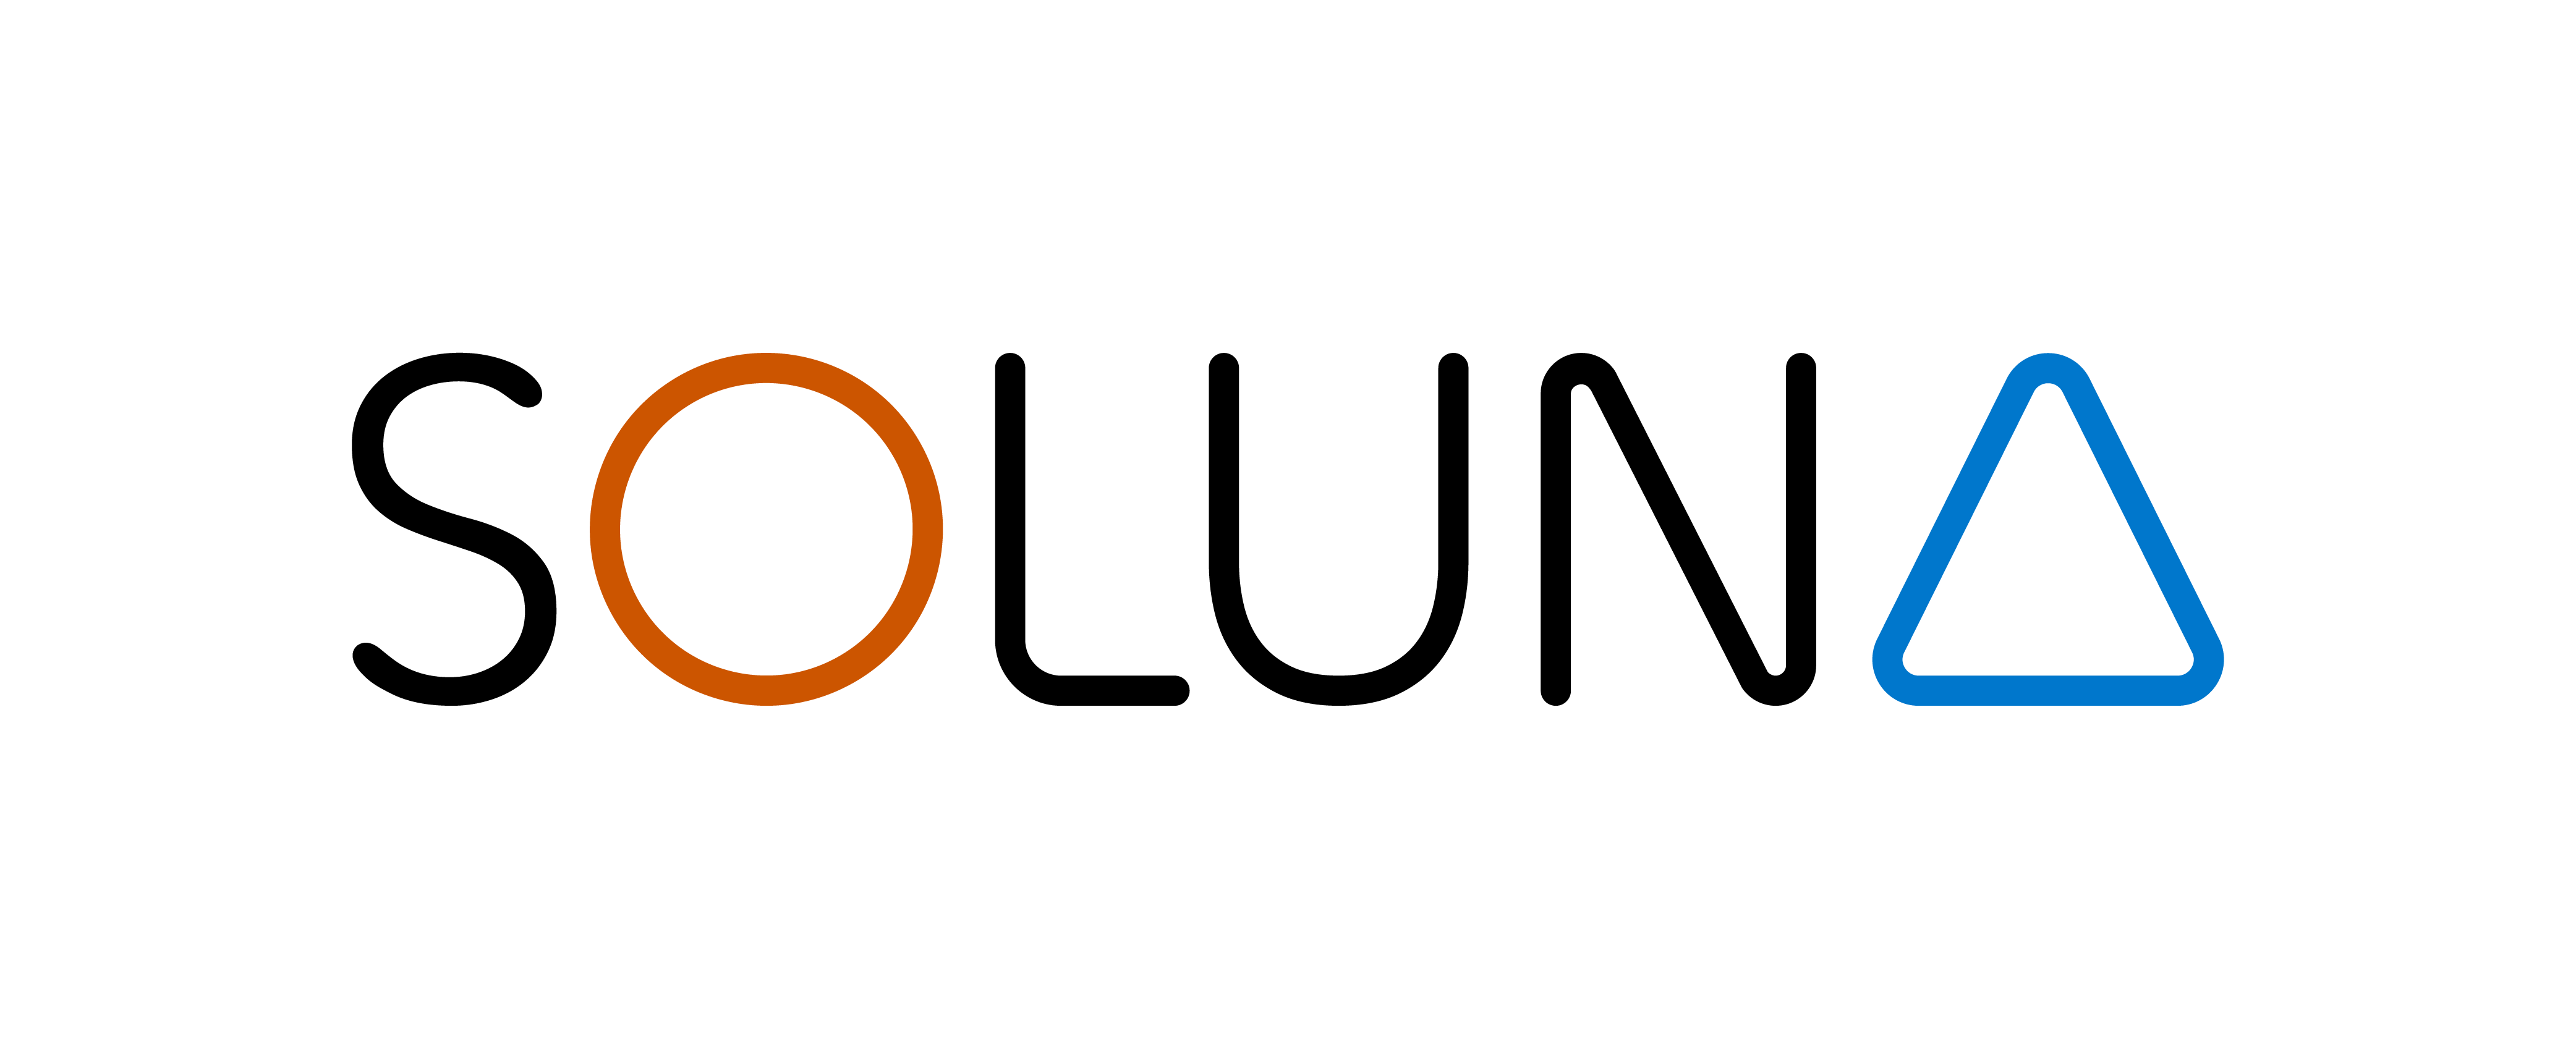 About Us - Soluna